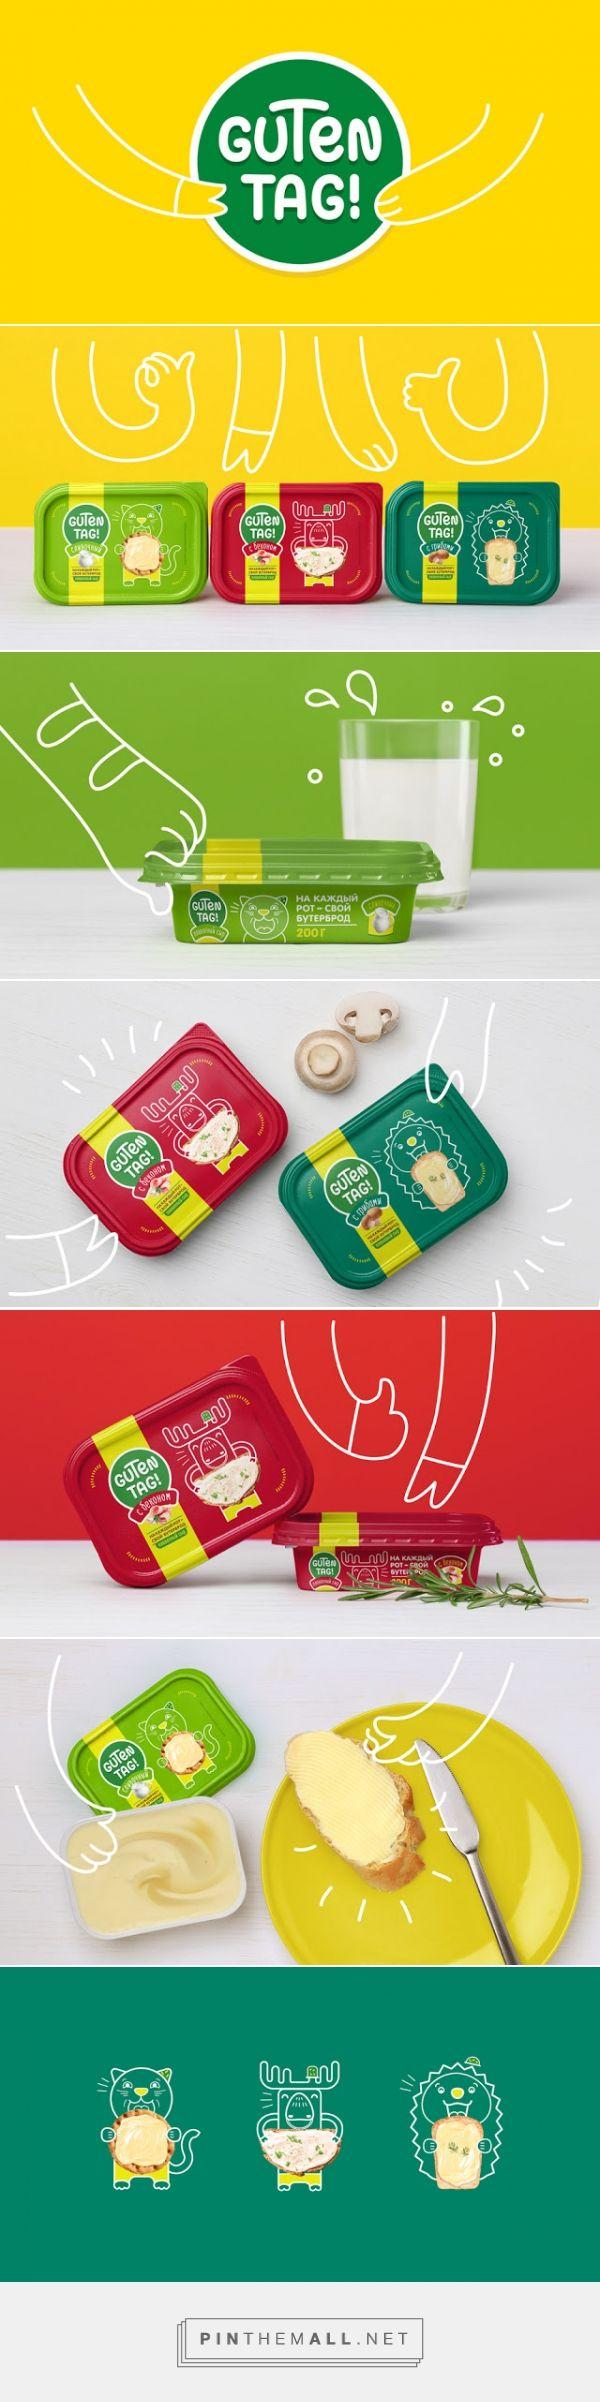 Guten Tag! Cheese Spreads Packaging designed by Fabula Branding - http://www.packagingoftheworld.com/2015/10/guten-tag.html